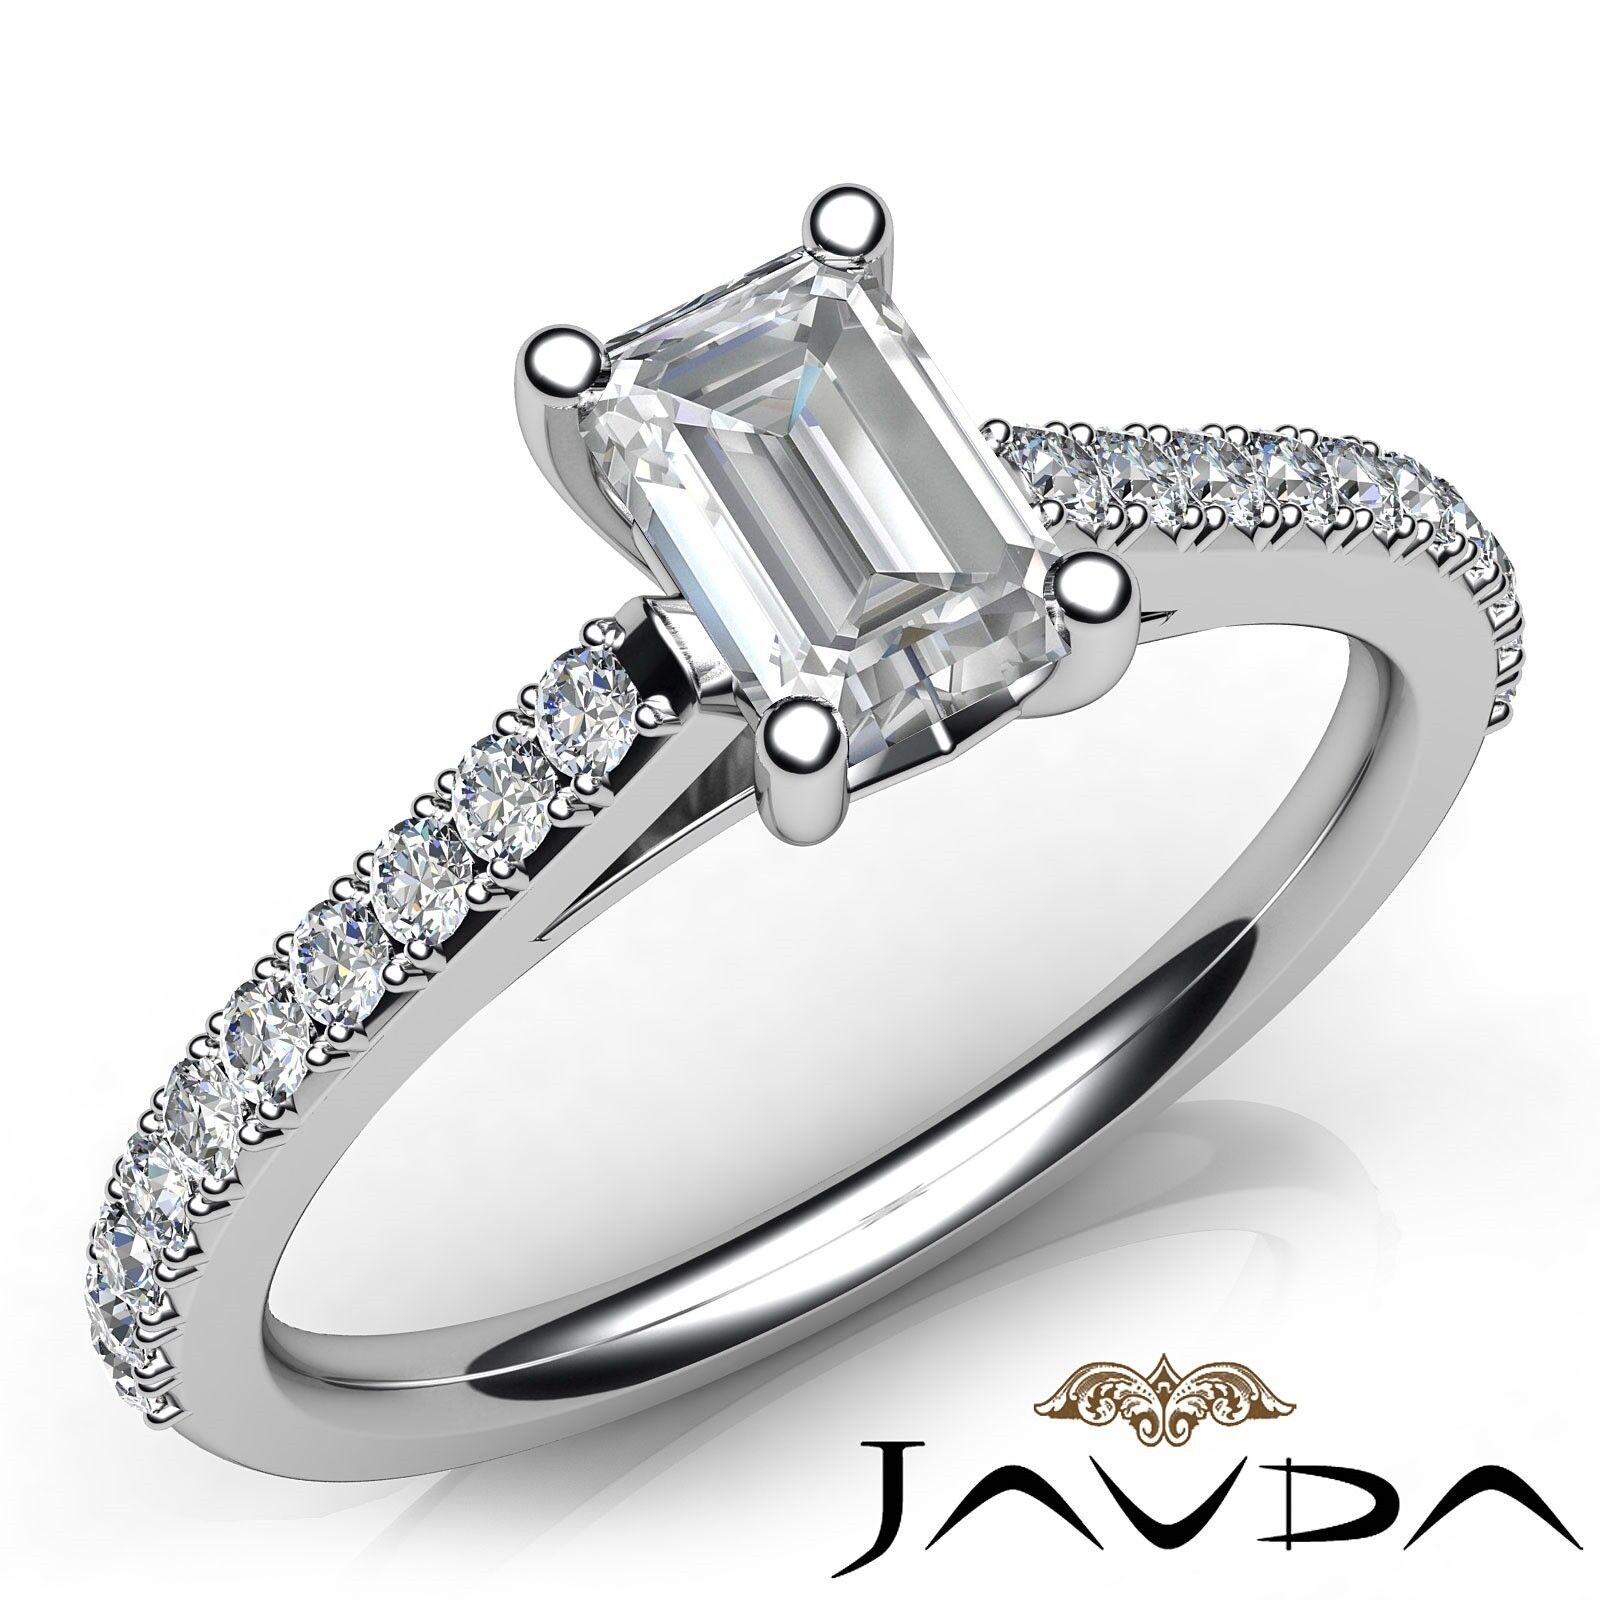 1ct Classic Prong Set Emerald Diamond Engagement Ring Rings GIA G-VS1 White Gold